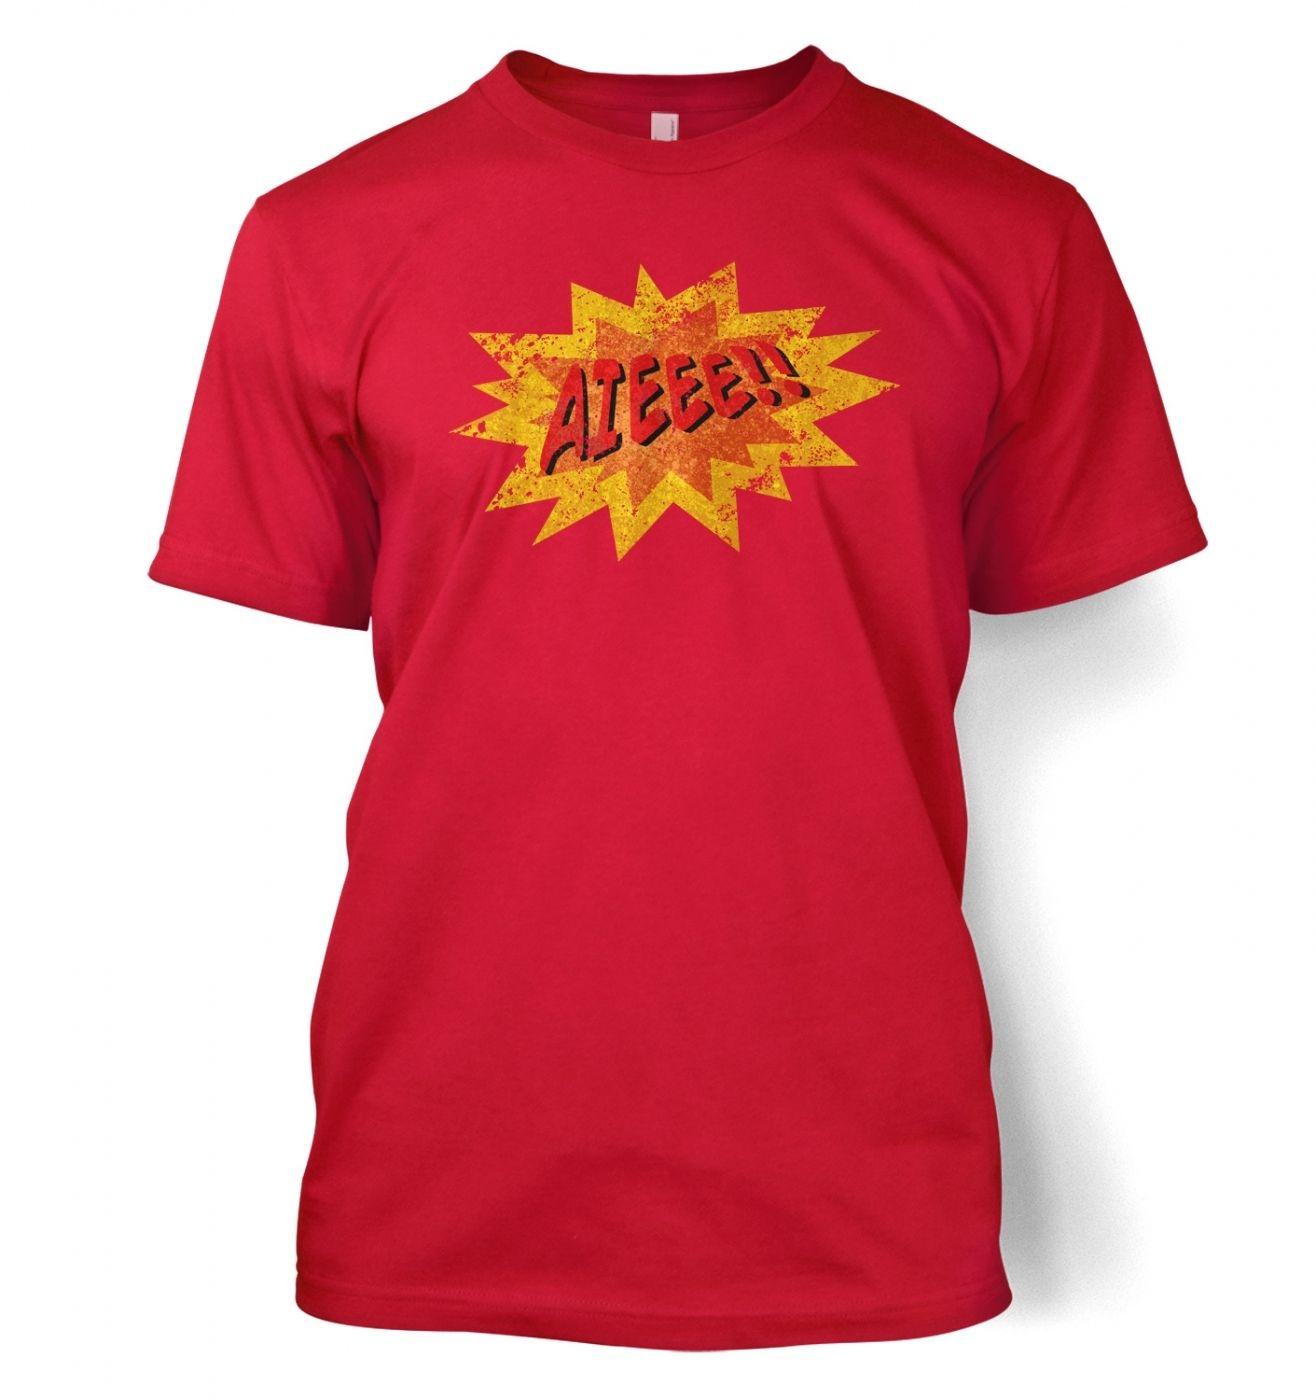 Aieee men's t-shirt